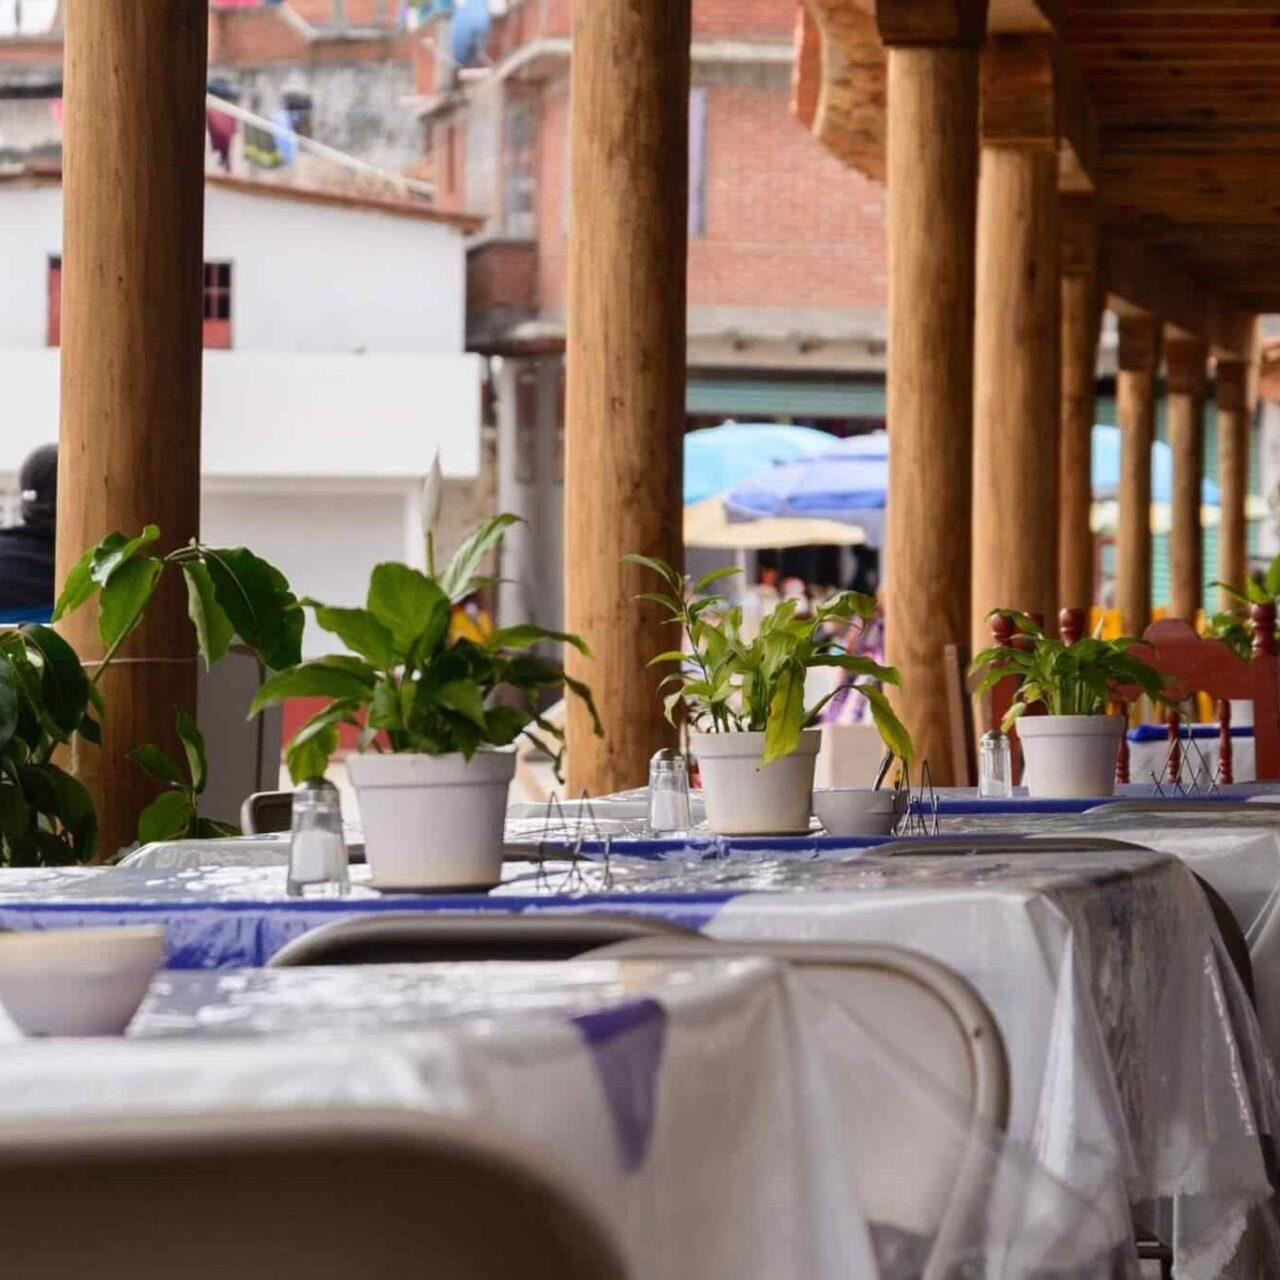 https://trustmark.org/wp-content/uploads/2017/10/restaurant-mexican-17-1280x1280.jpg